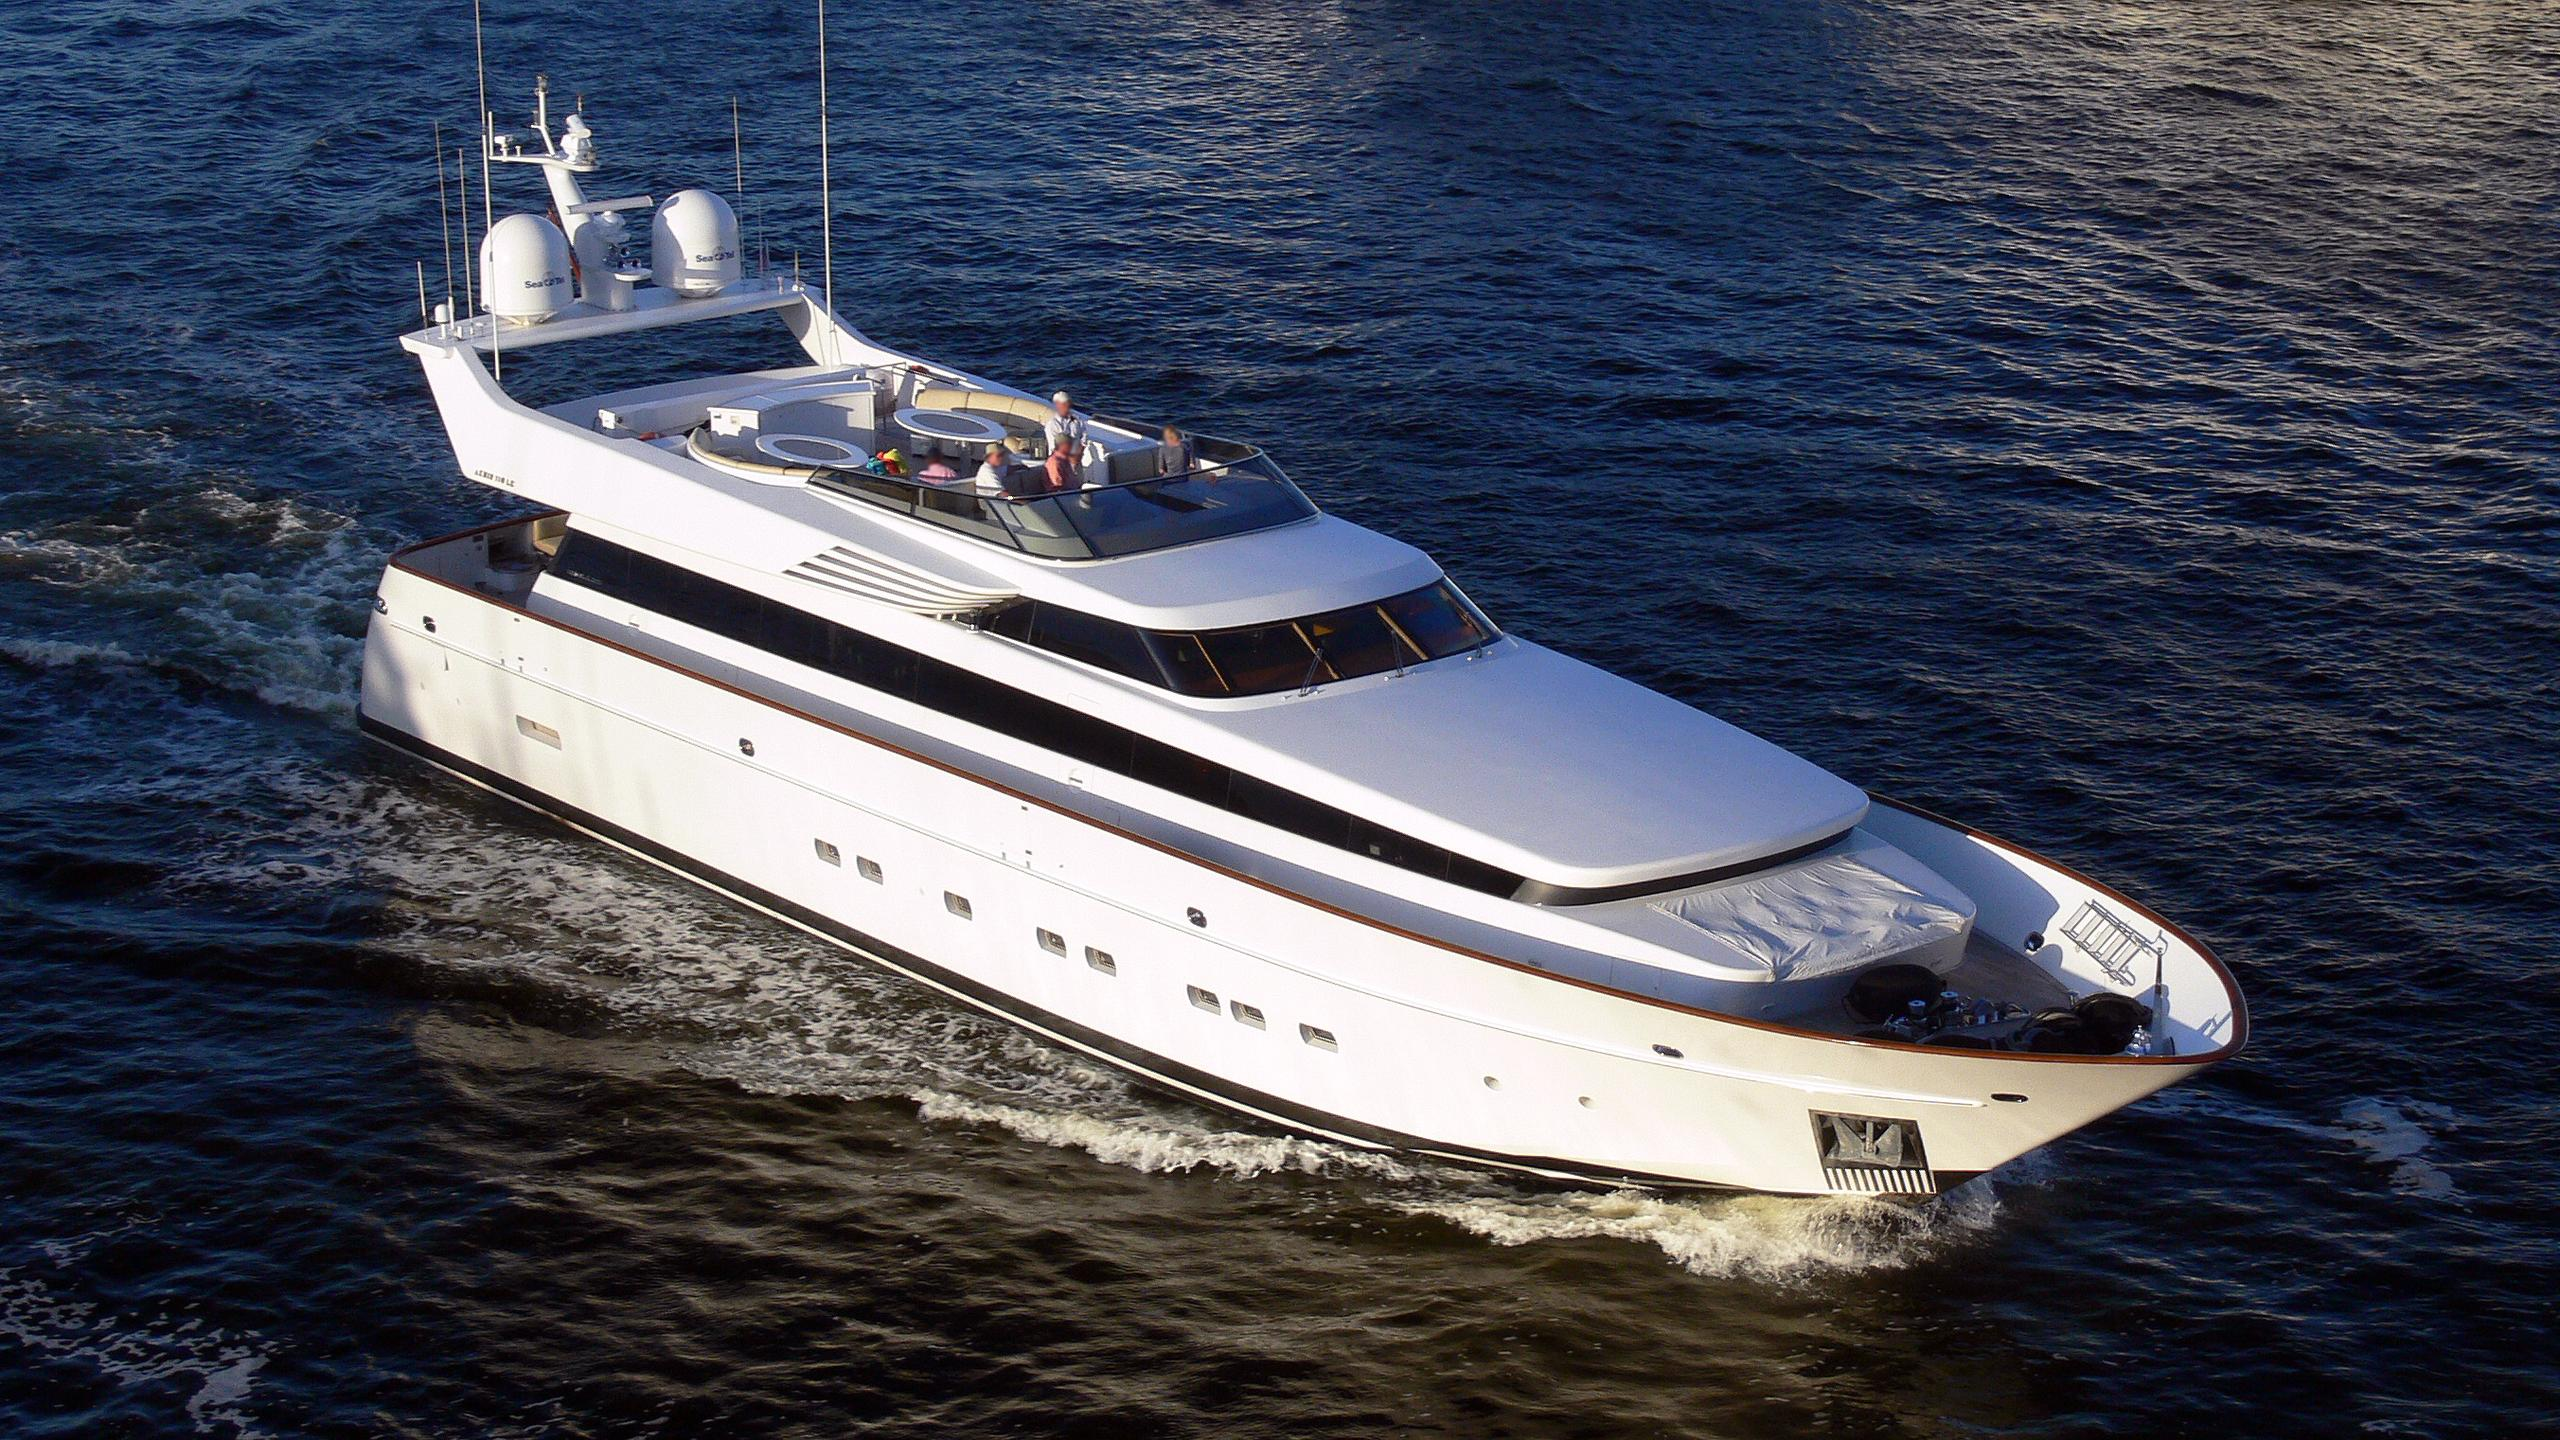 lunasea-motor-yacht-cantieri-di-pisa-20000-akhir-34s-34m-cruising-half-profile